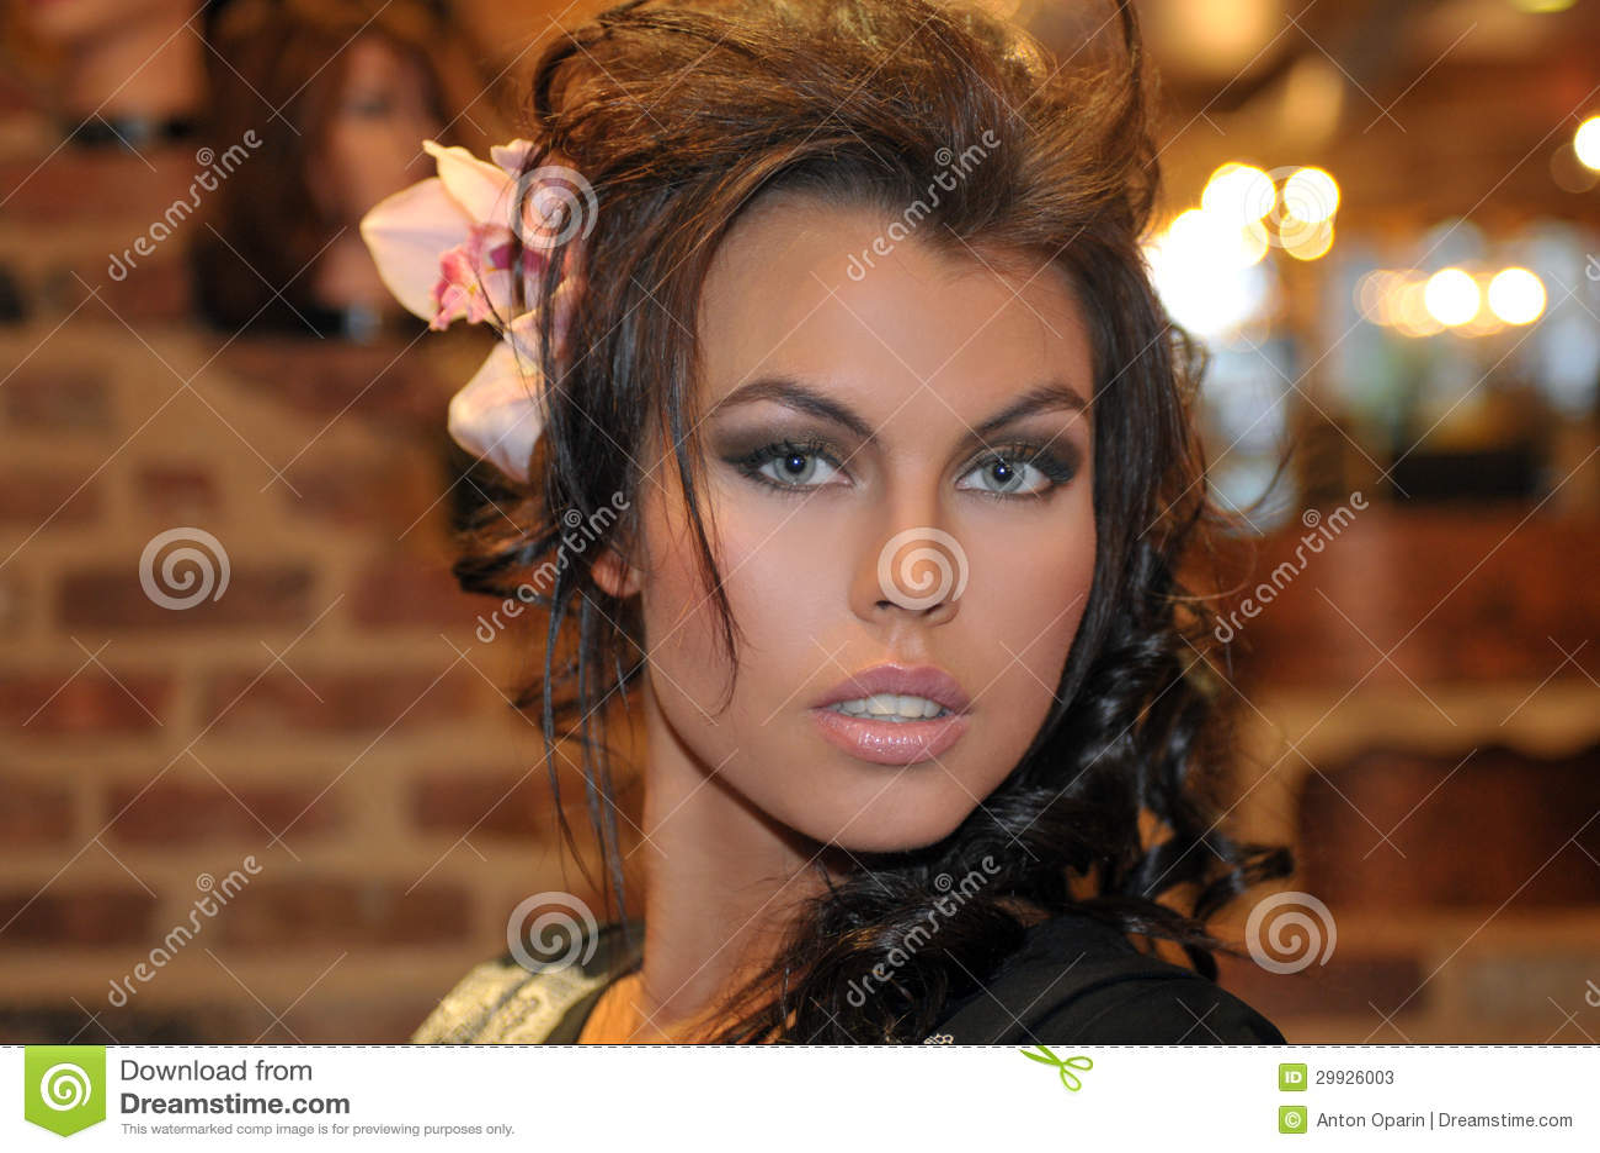 252cher verkaufen top 8 der bely flowers shiny model nude may 2016